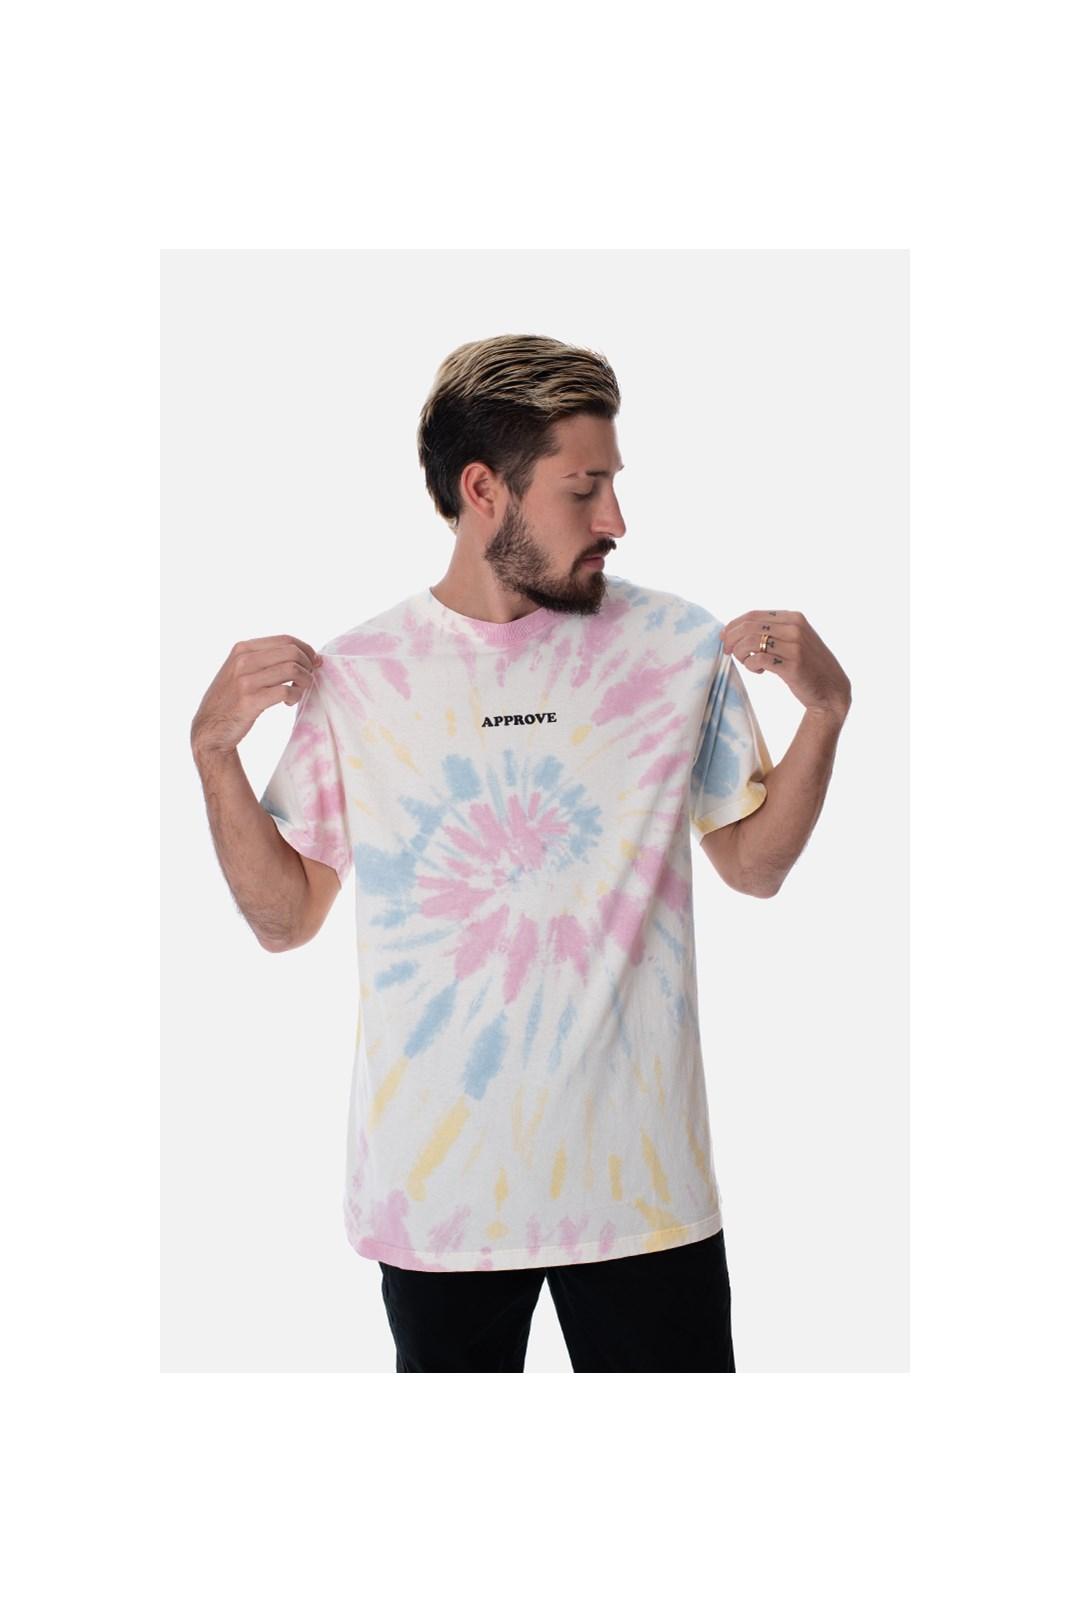 Camiseta Regular Approve Tie Dye Esponjada Colorida